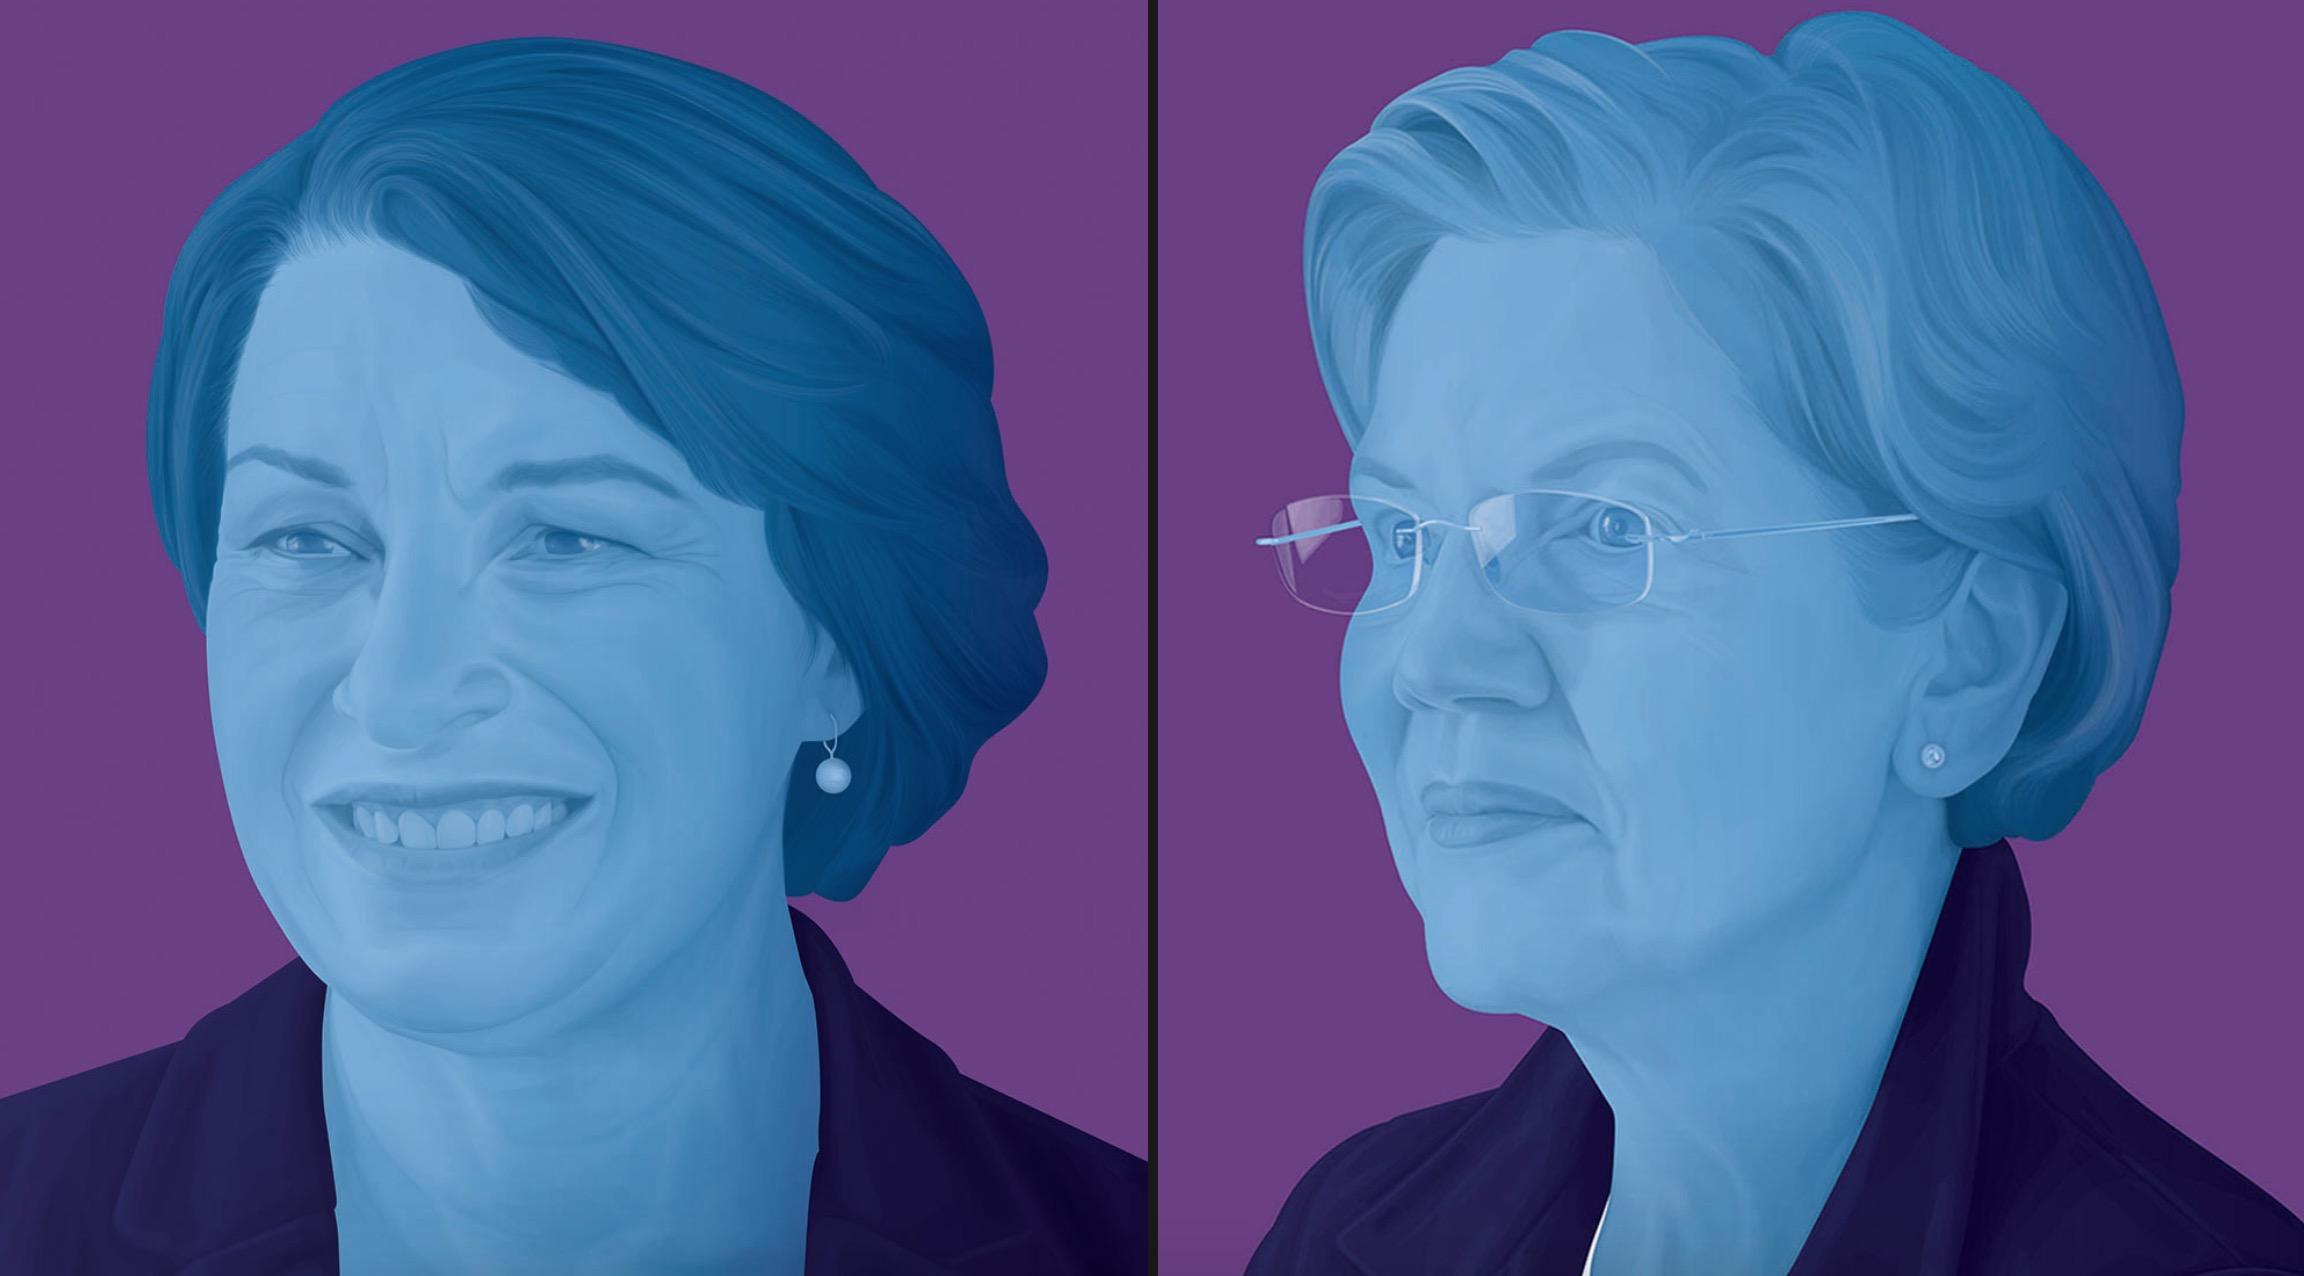 New York Times Endorses Elizabeth Warren And Amy Klobuchar In Democratic Primary